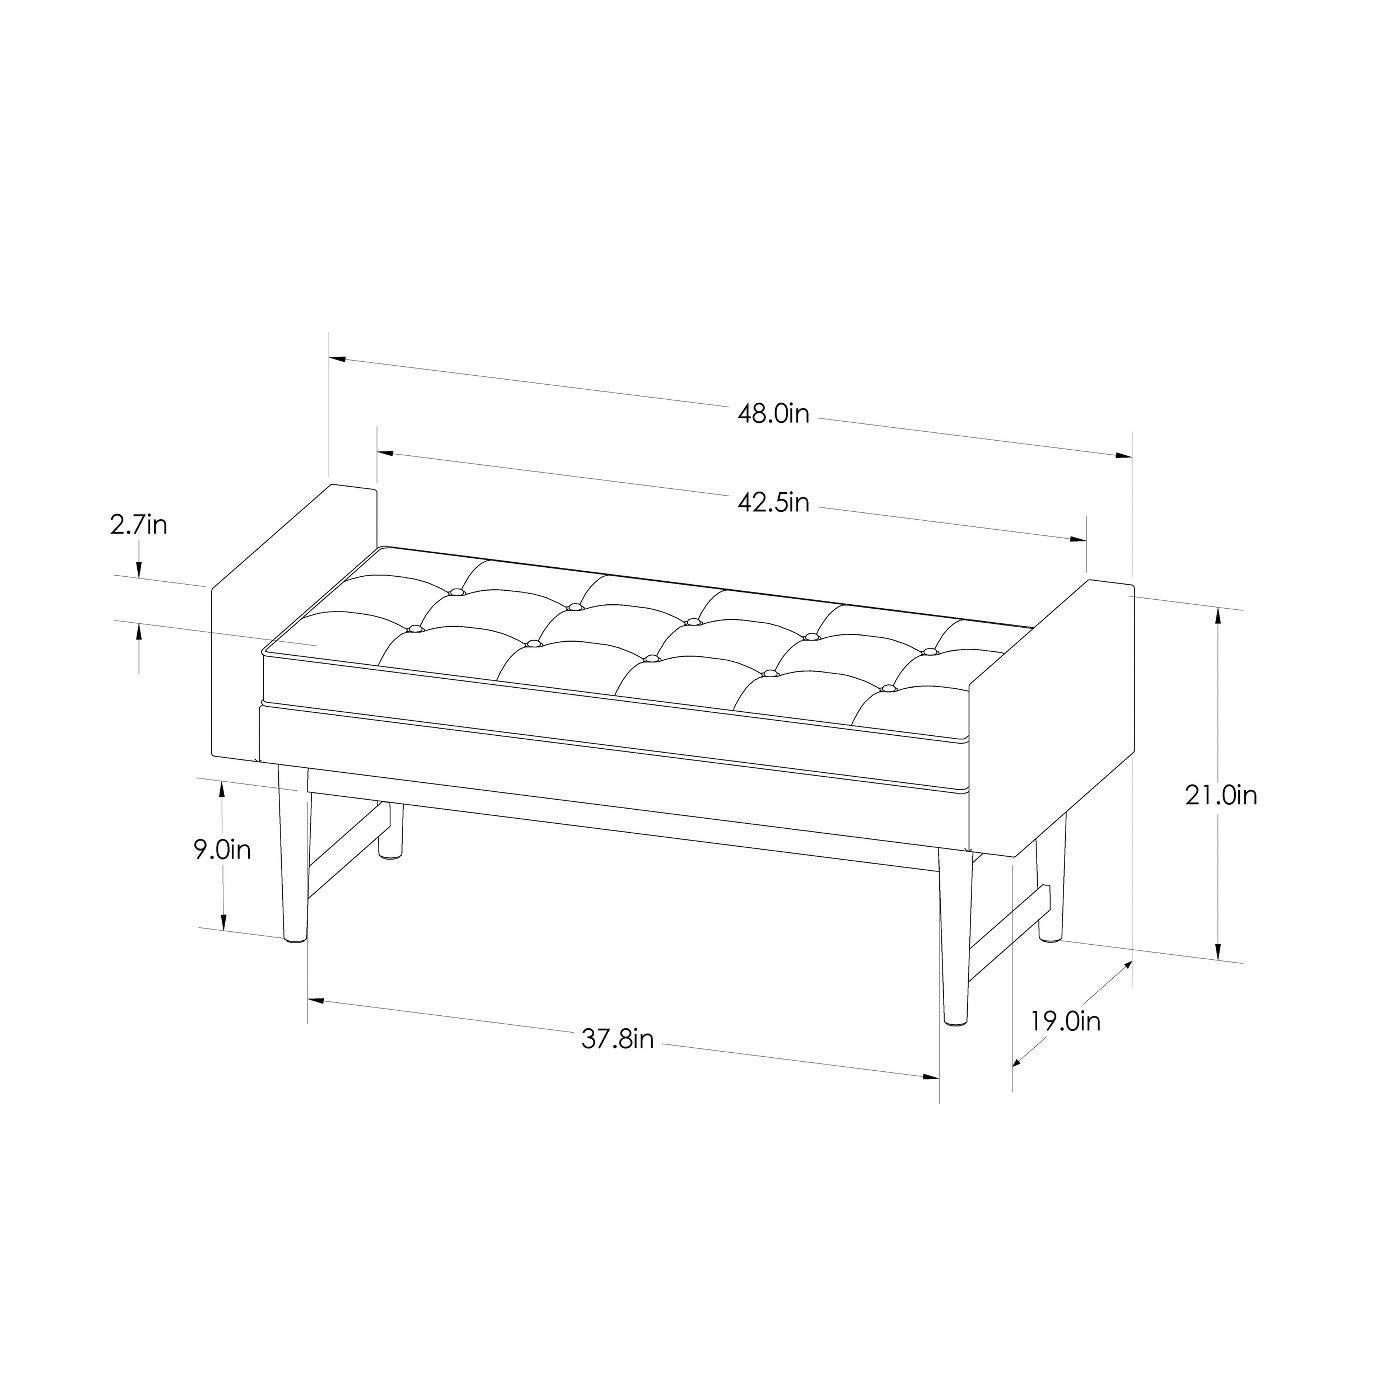 Awe Inspiring Amazon Com Verken Mid Century Modern Faux Leather Bench Inzonedesignstudio Interior Chair Design Inzonedesignstudiocom